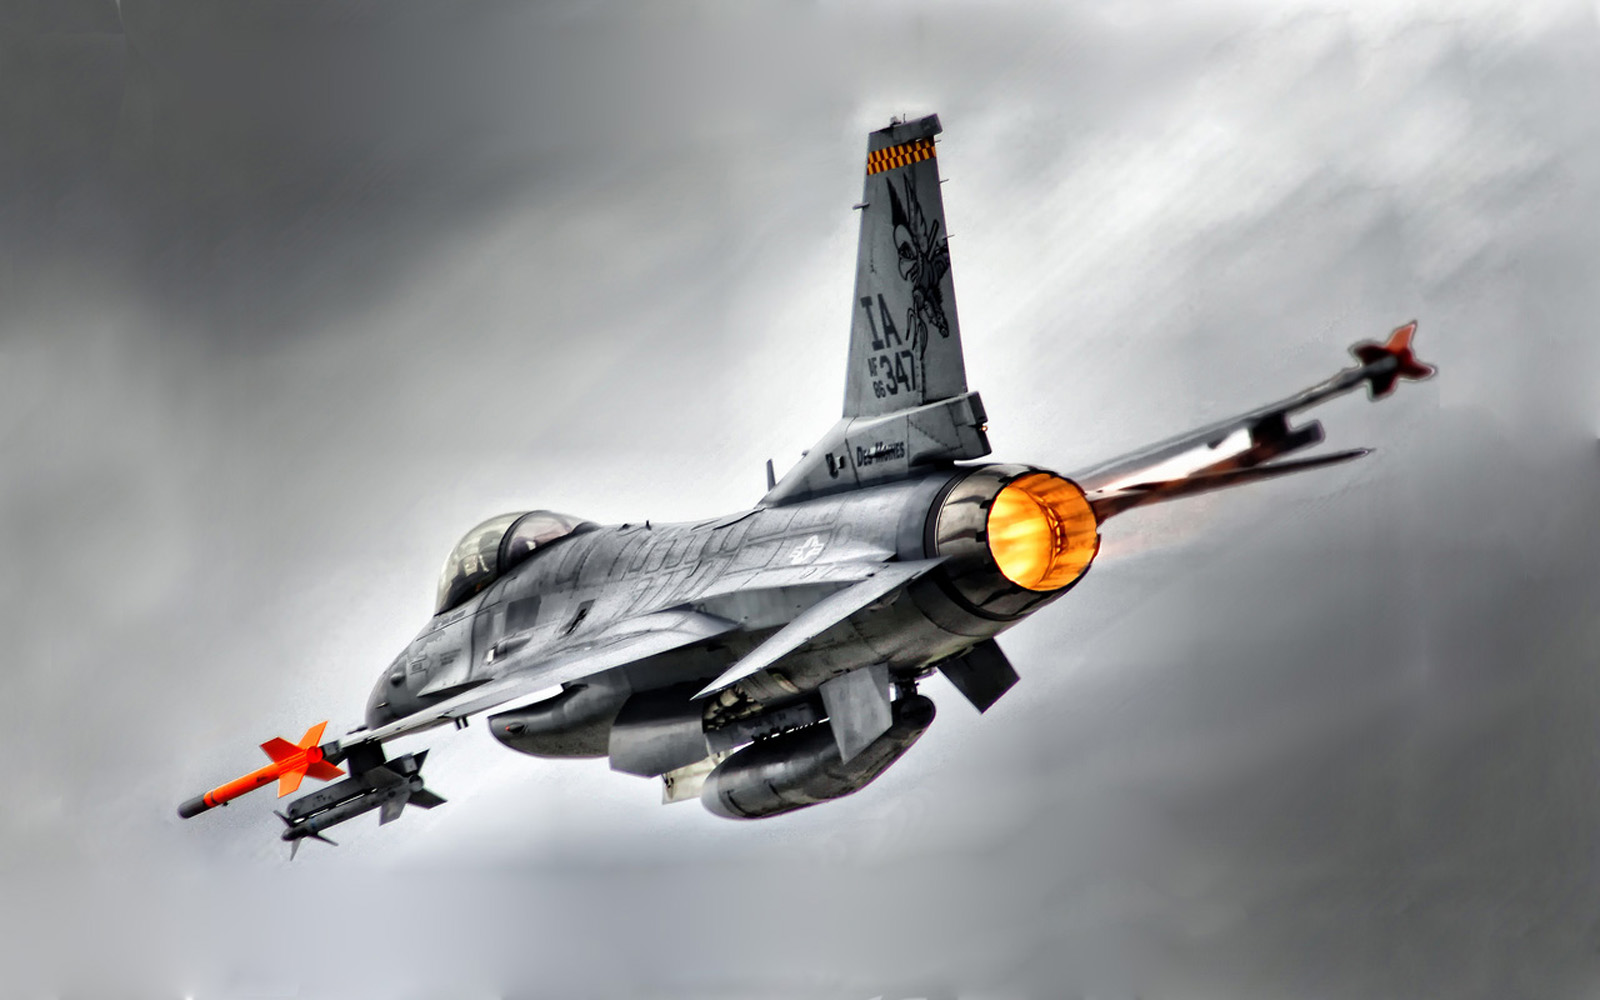 F-16 Falcon HD Wallpapers Duvar Kağıtları ~ Kaliteli Resim